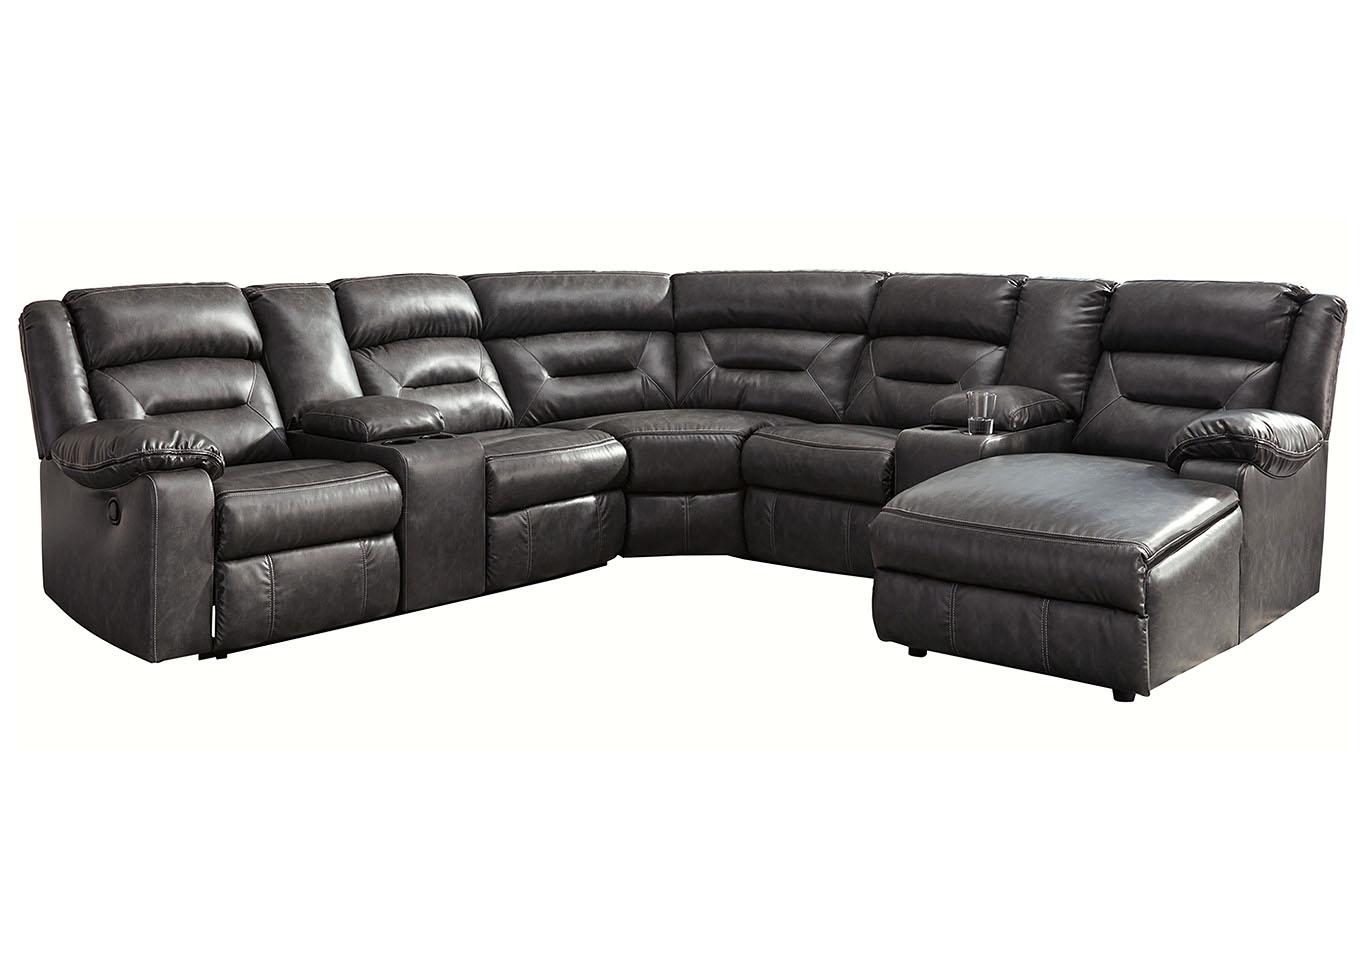 Astounding Star Furniture Coahoma Dark Gray Pu Leather 7 Piece Raf Uwap Interior Chair Design Uwaporg